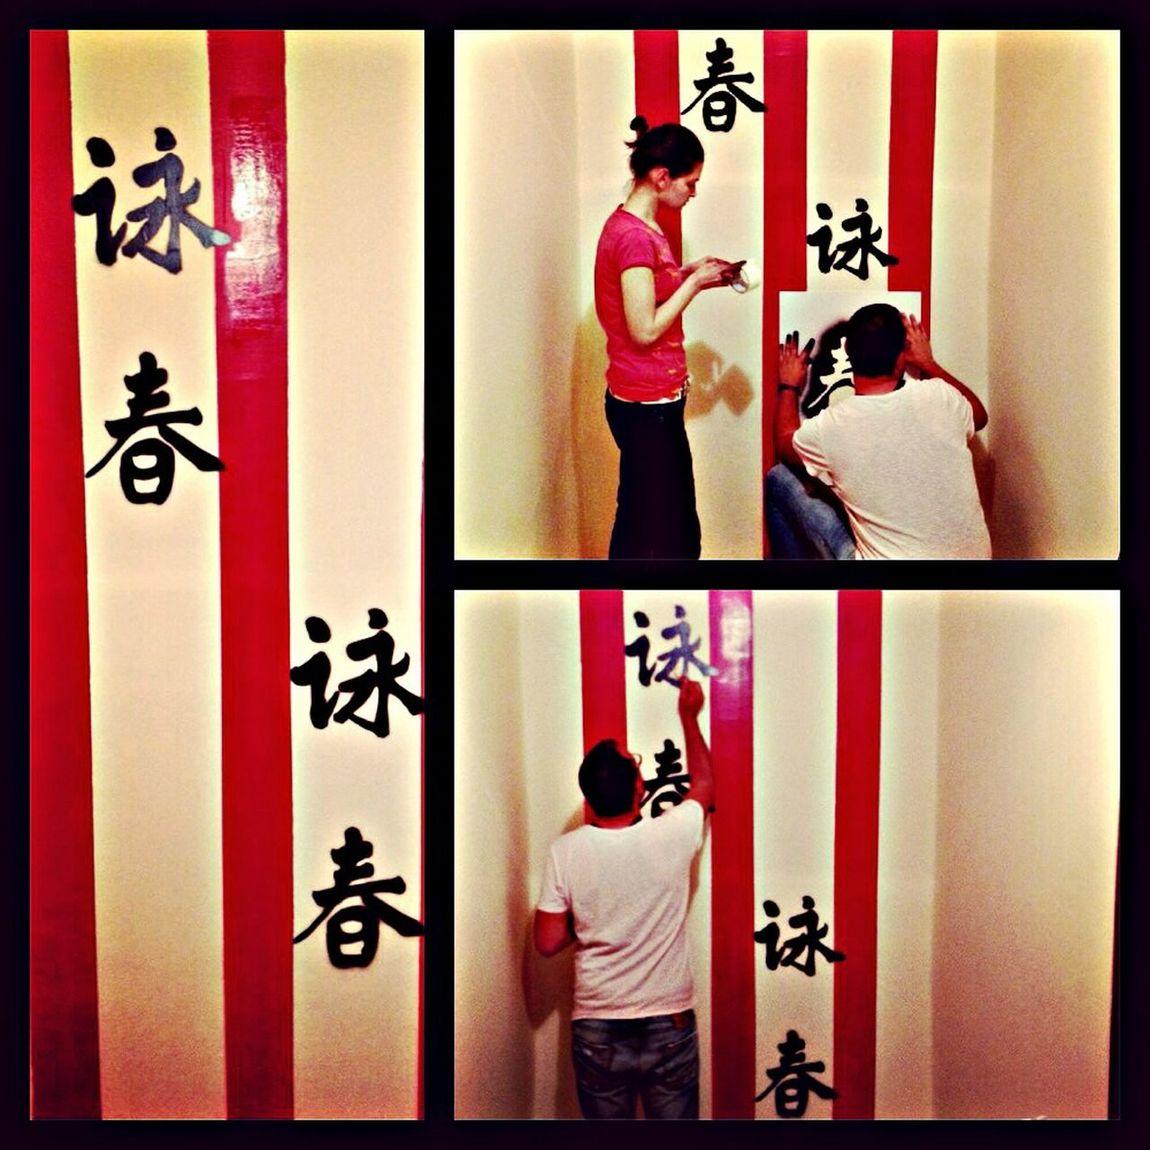 Enjoying Life Wall Art Chinese Art Wingtsun Wingtsunlive Ankara Academy